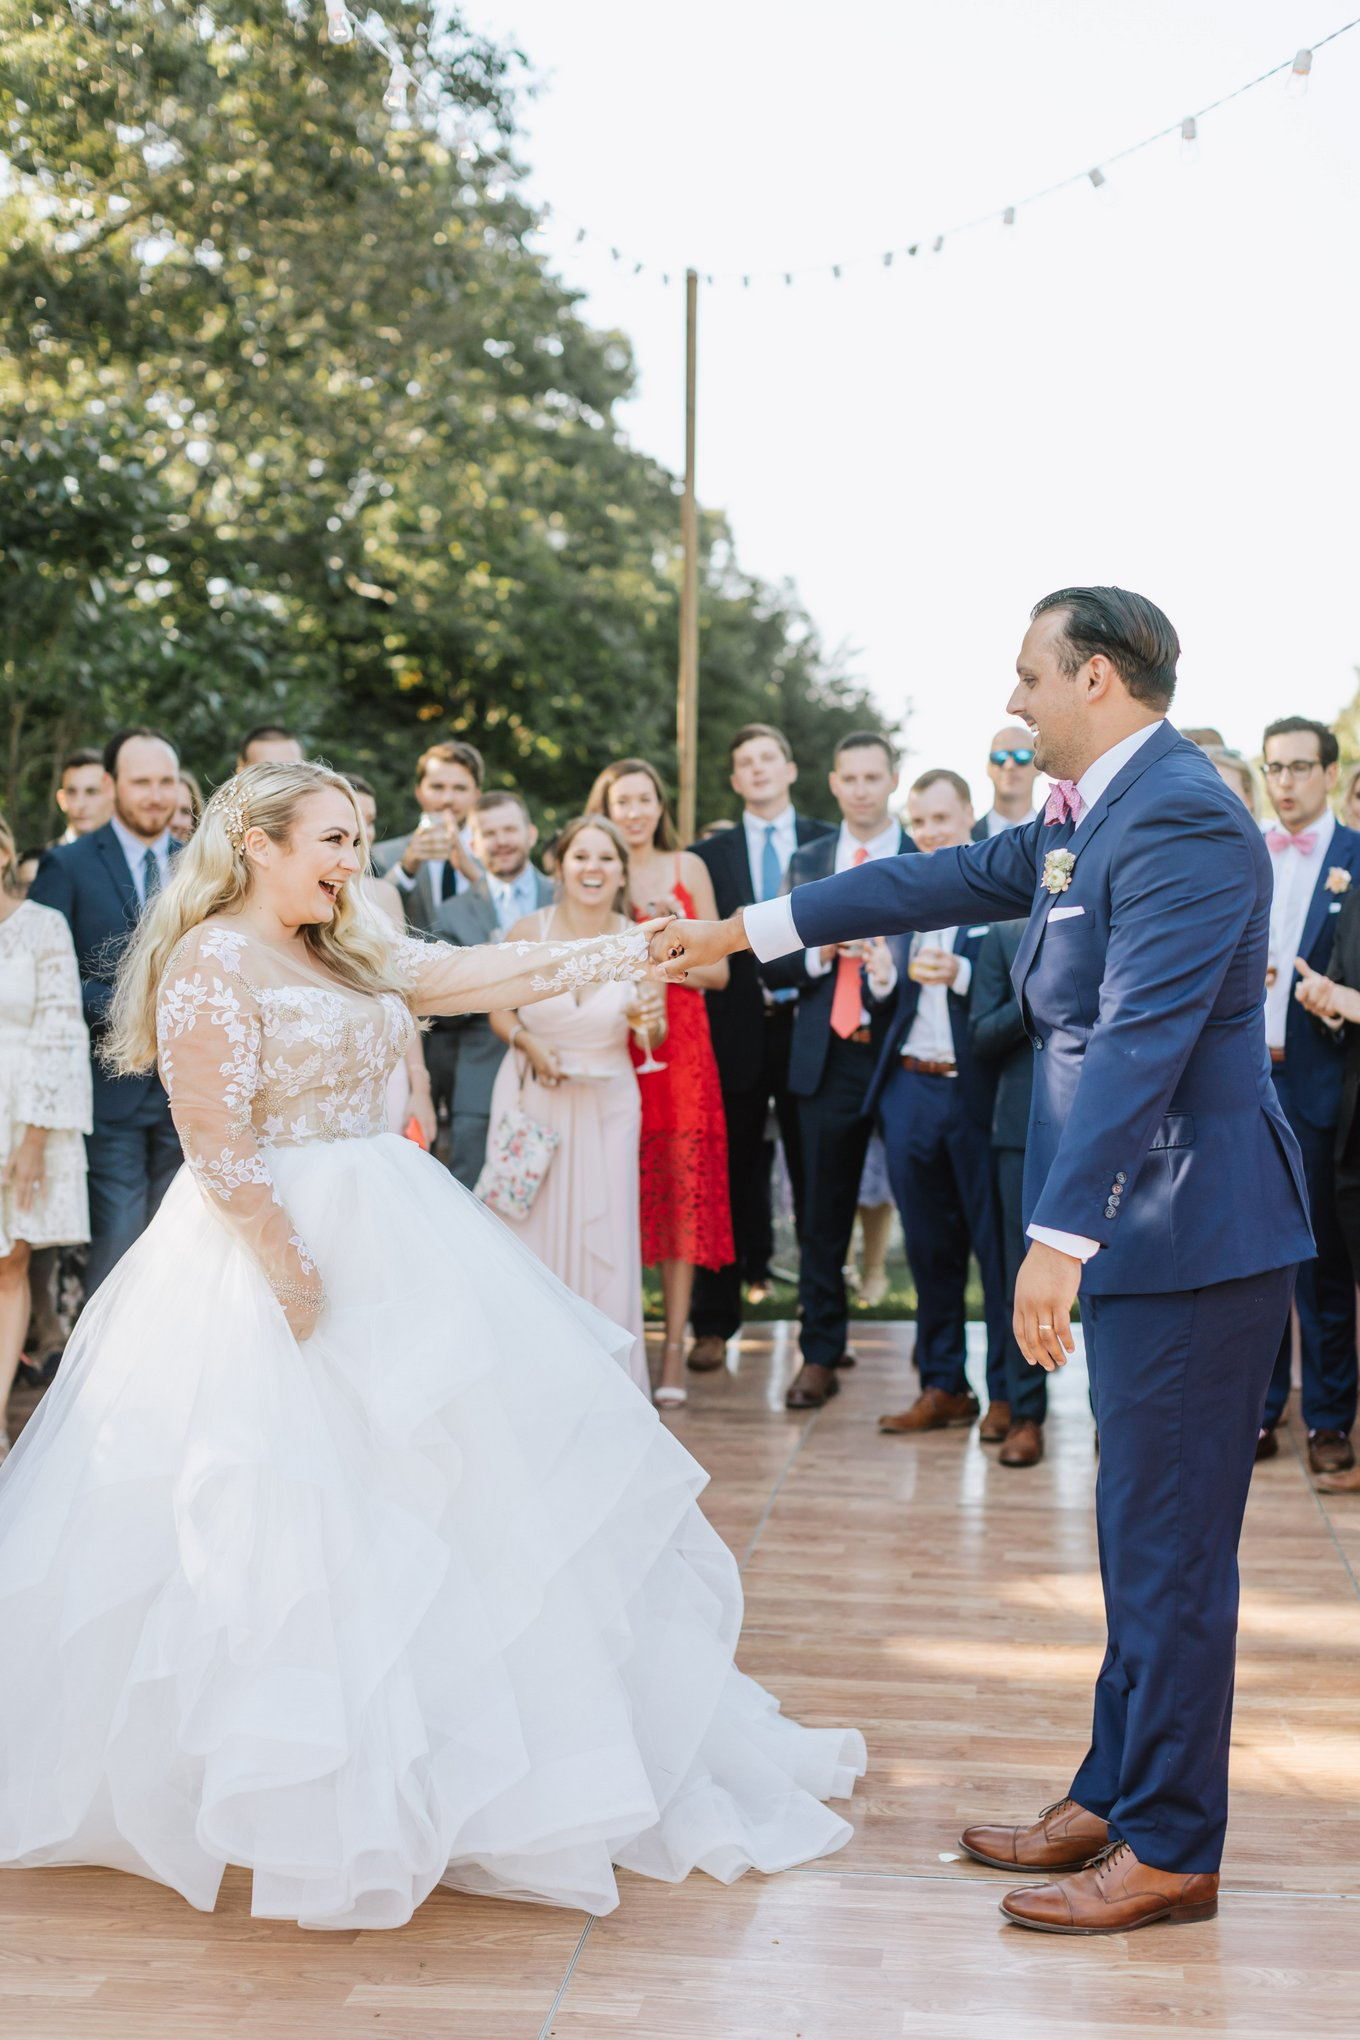 Marthas-Vineyard-Wedding-Photographer-Beach-Plum-Inn-35.jpg